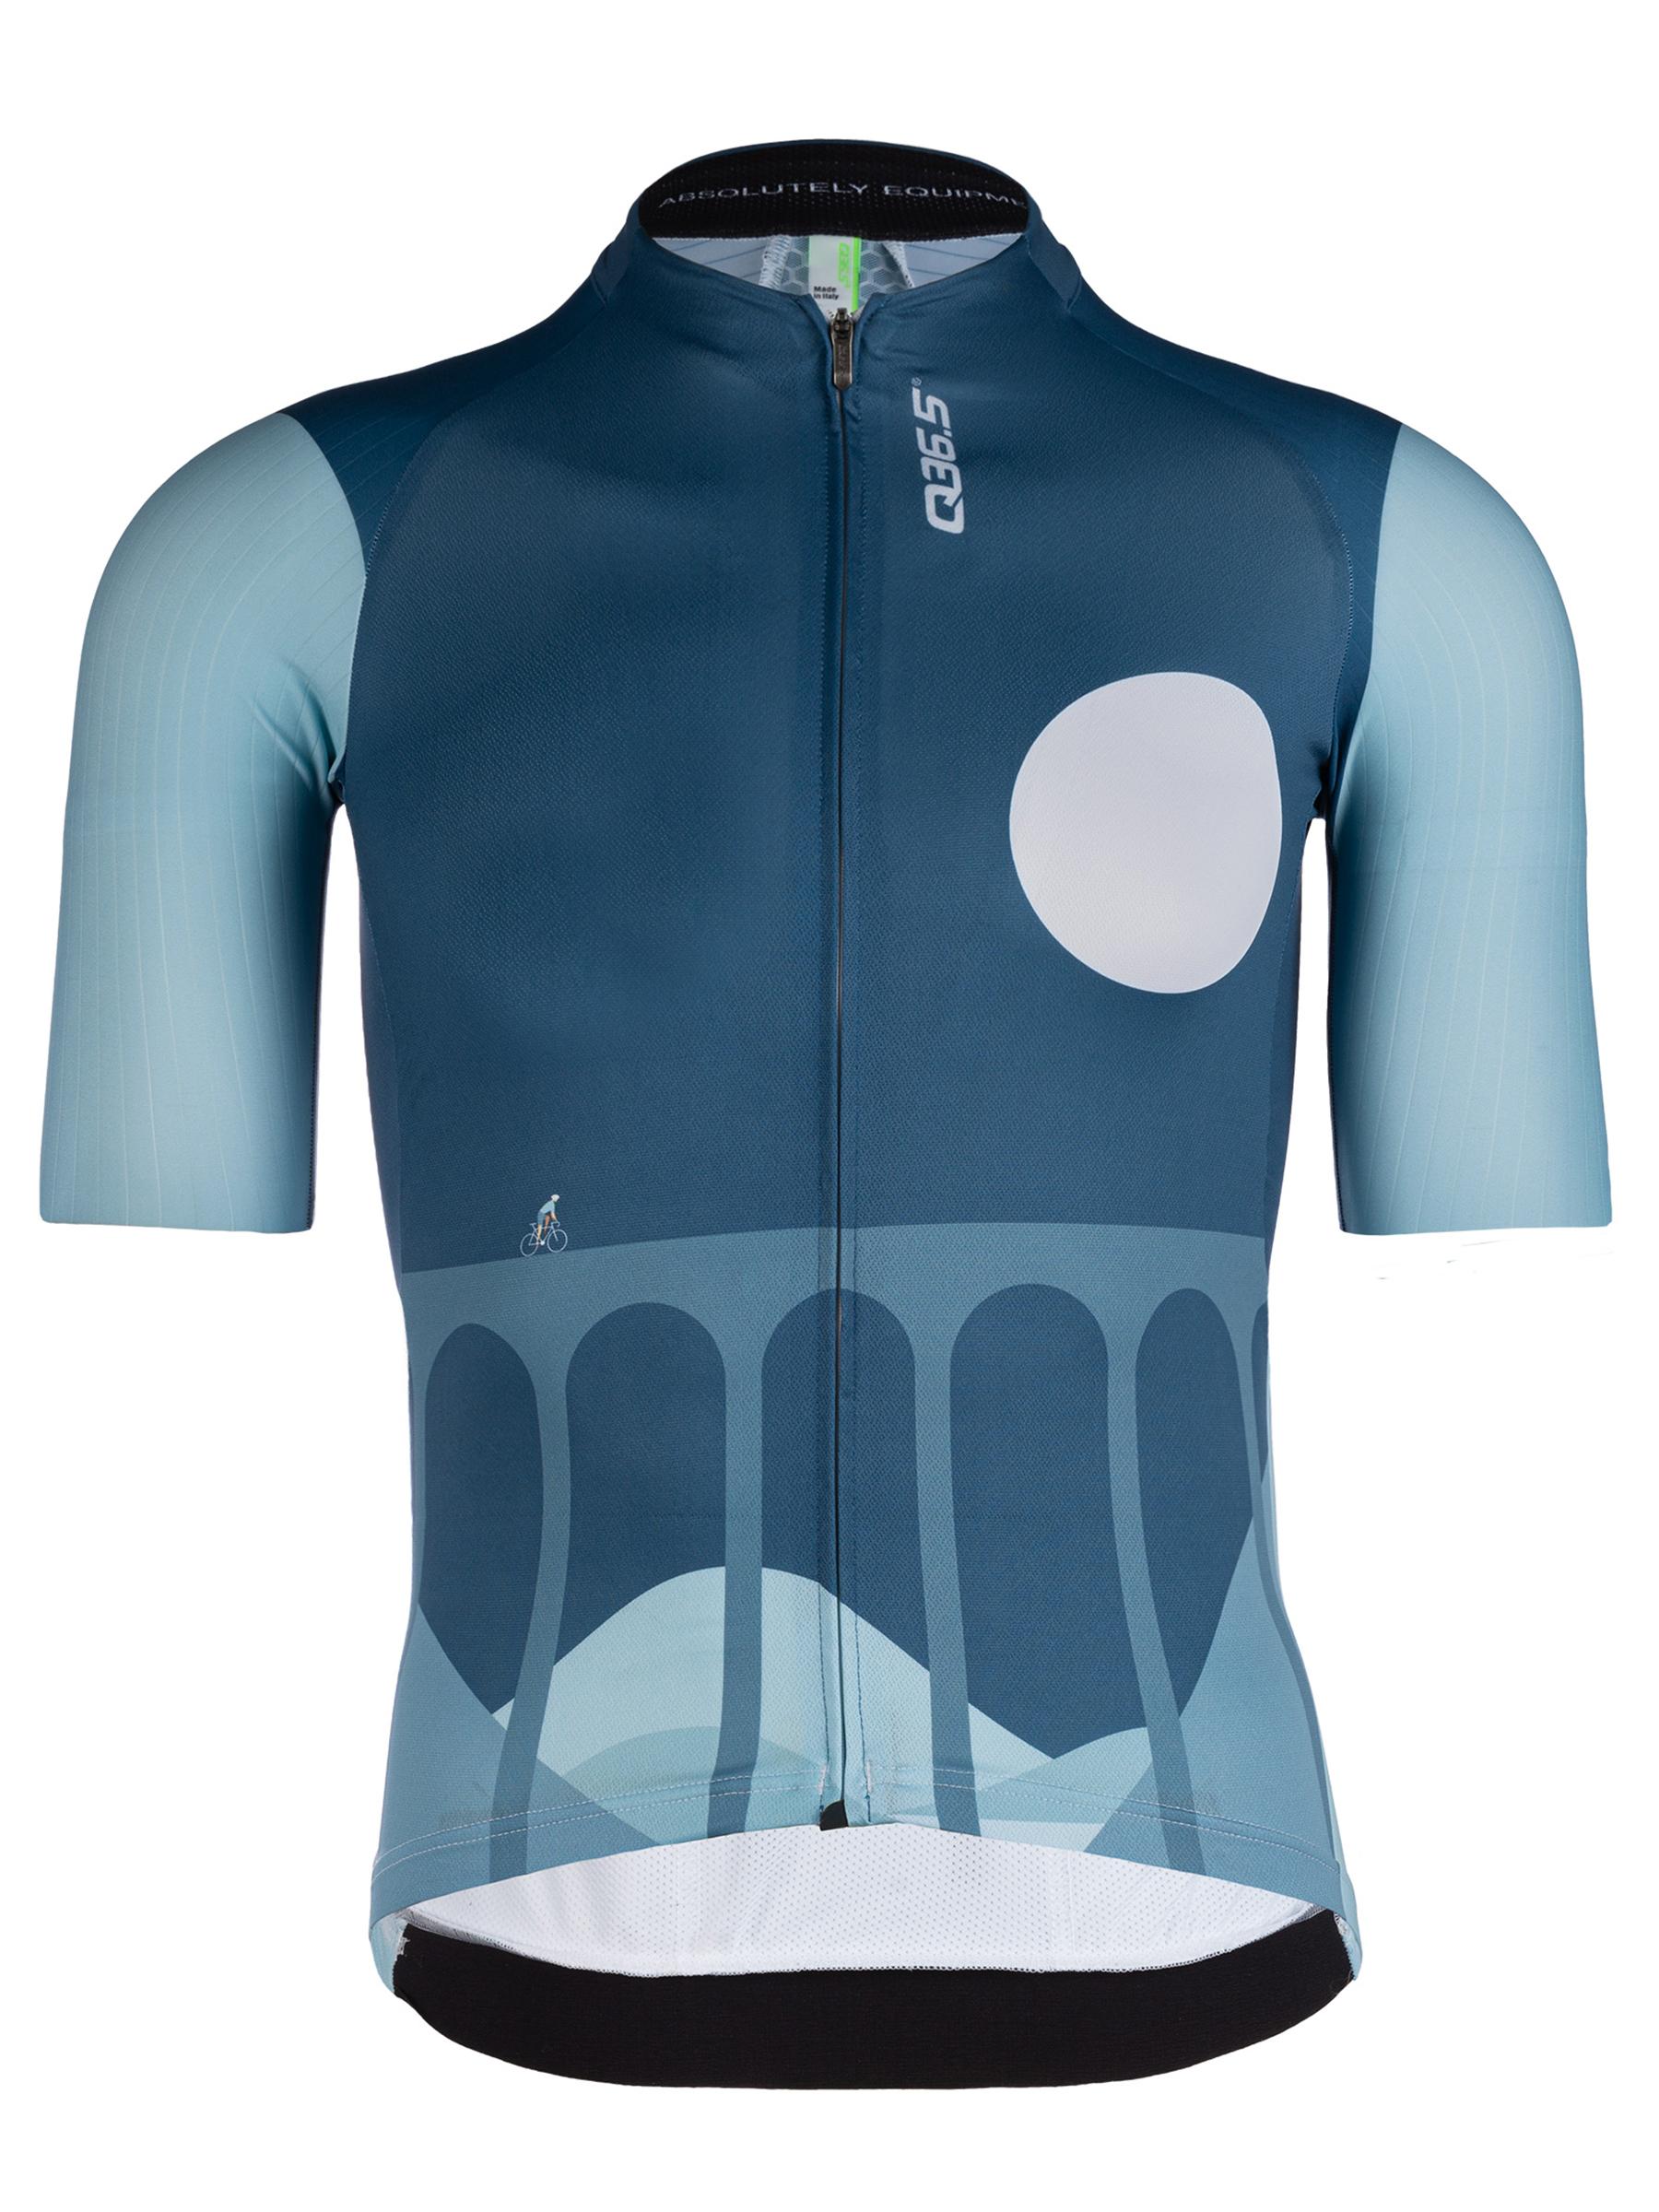 Maillot ciclismo hombre manga corta R2 Globe Trotter azul Q36.5